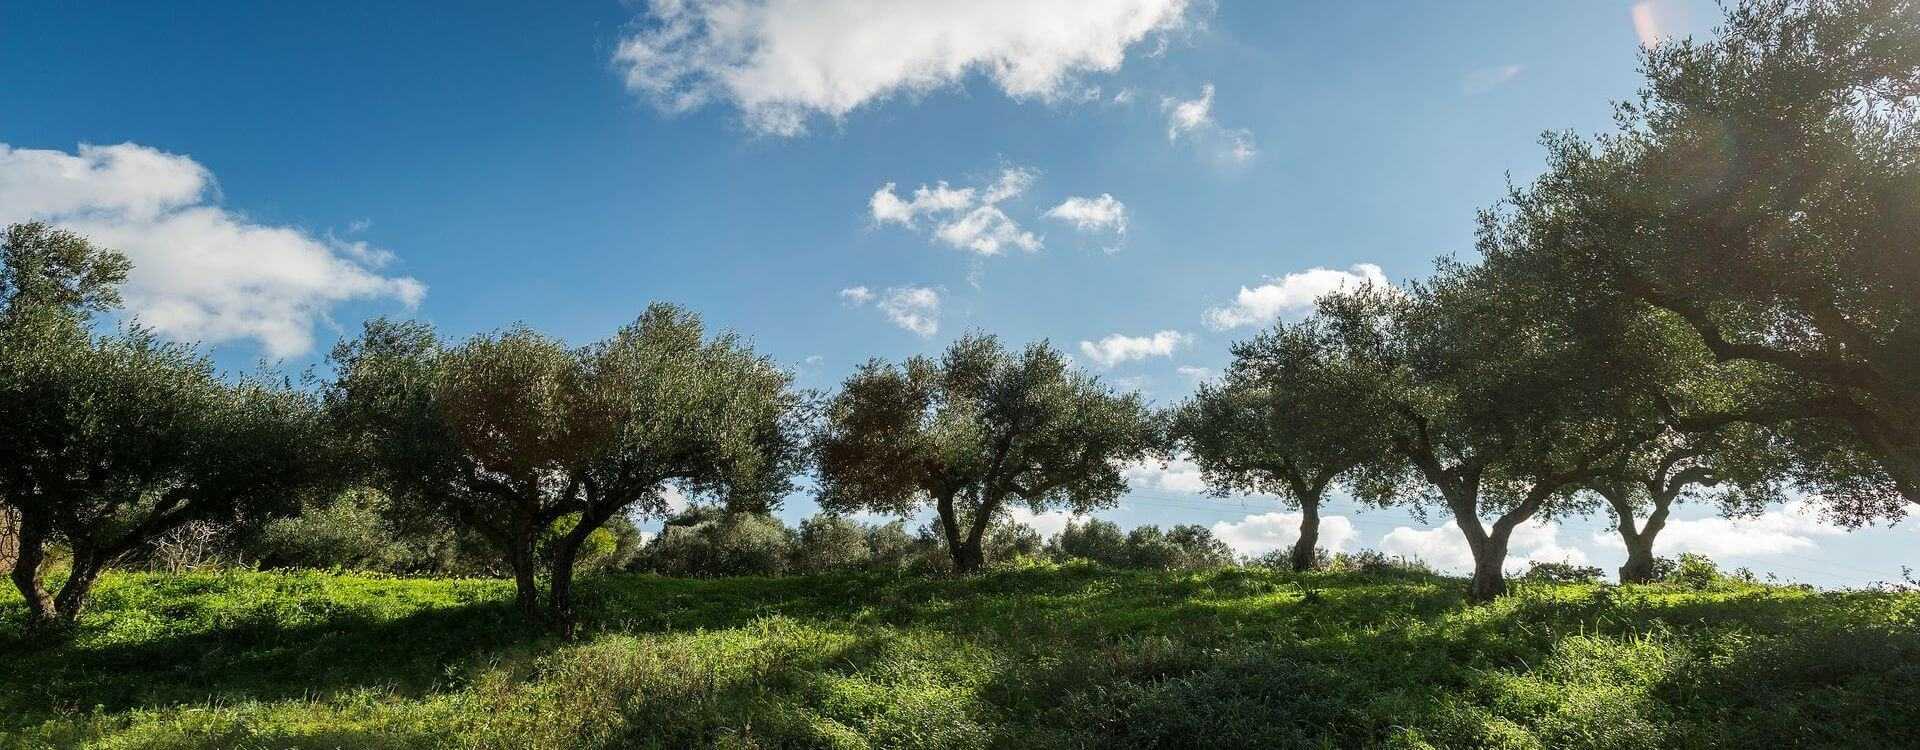 greeks-optimistic-about-upcoming-harvest